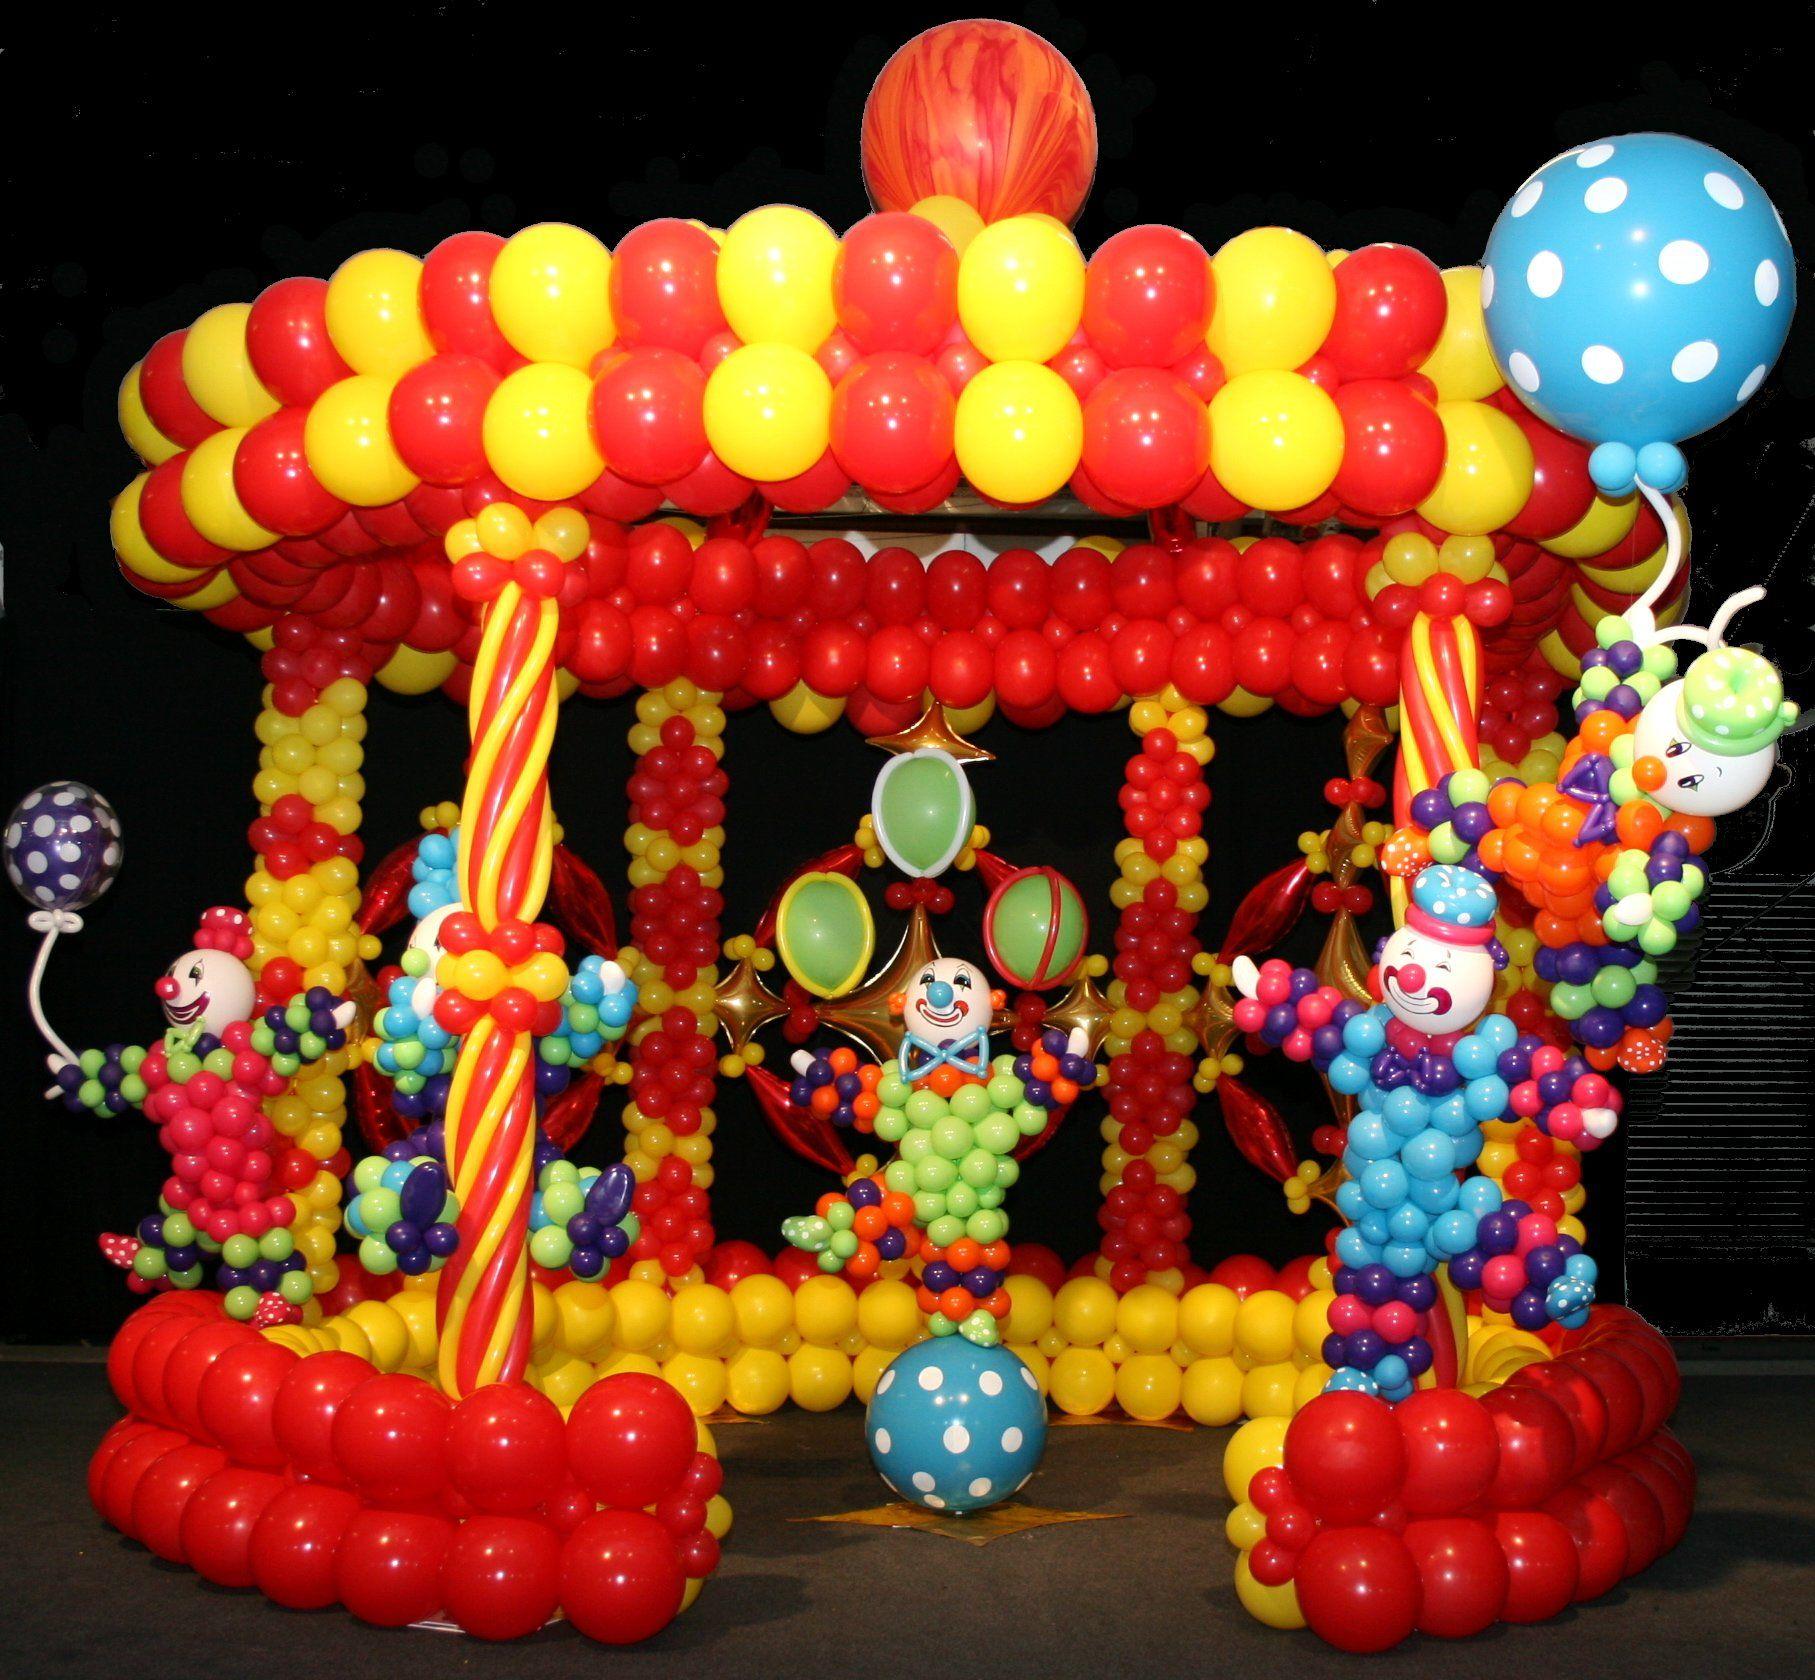 Circus Ring Balloon Canopy   Balloon Ideas   Pinterest ...